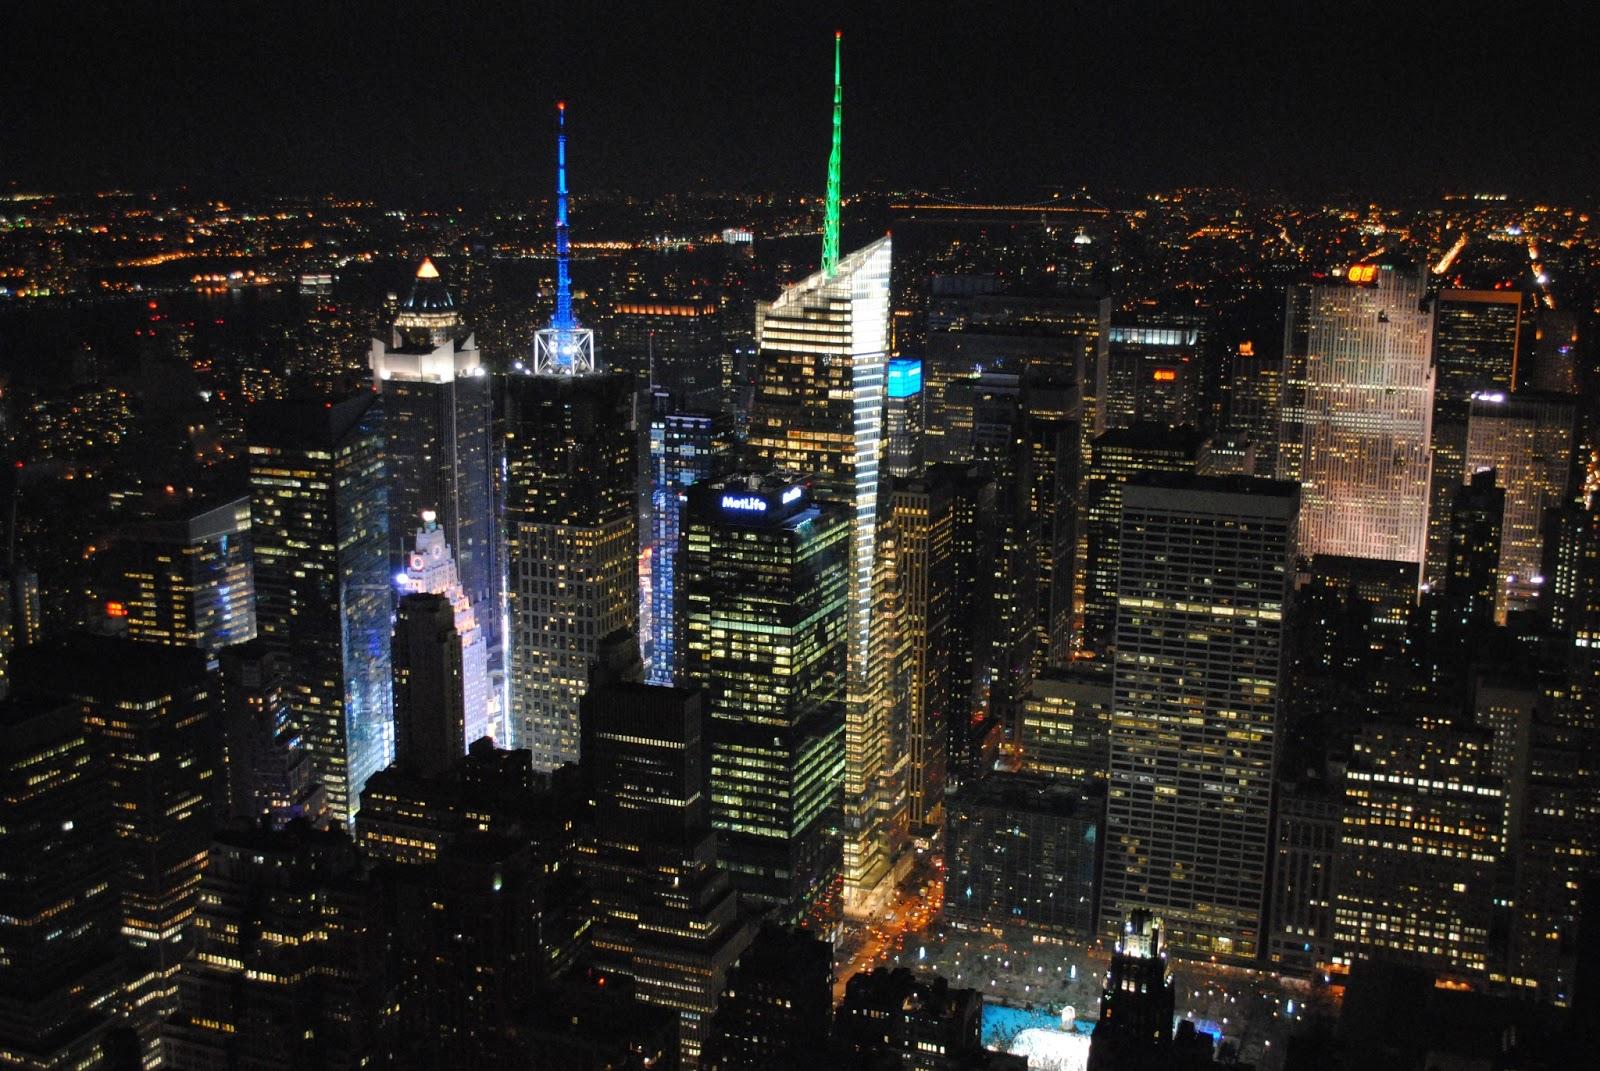 New York 1080p Wallpaper WallpaperSafari Image Source From This